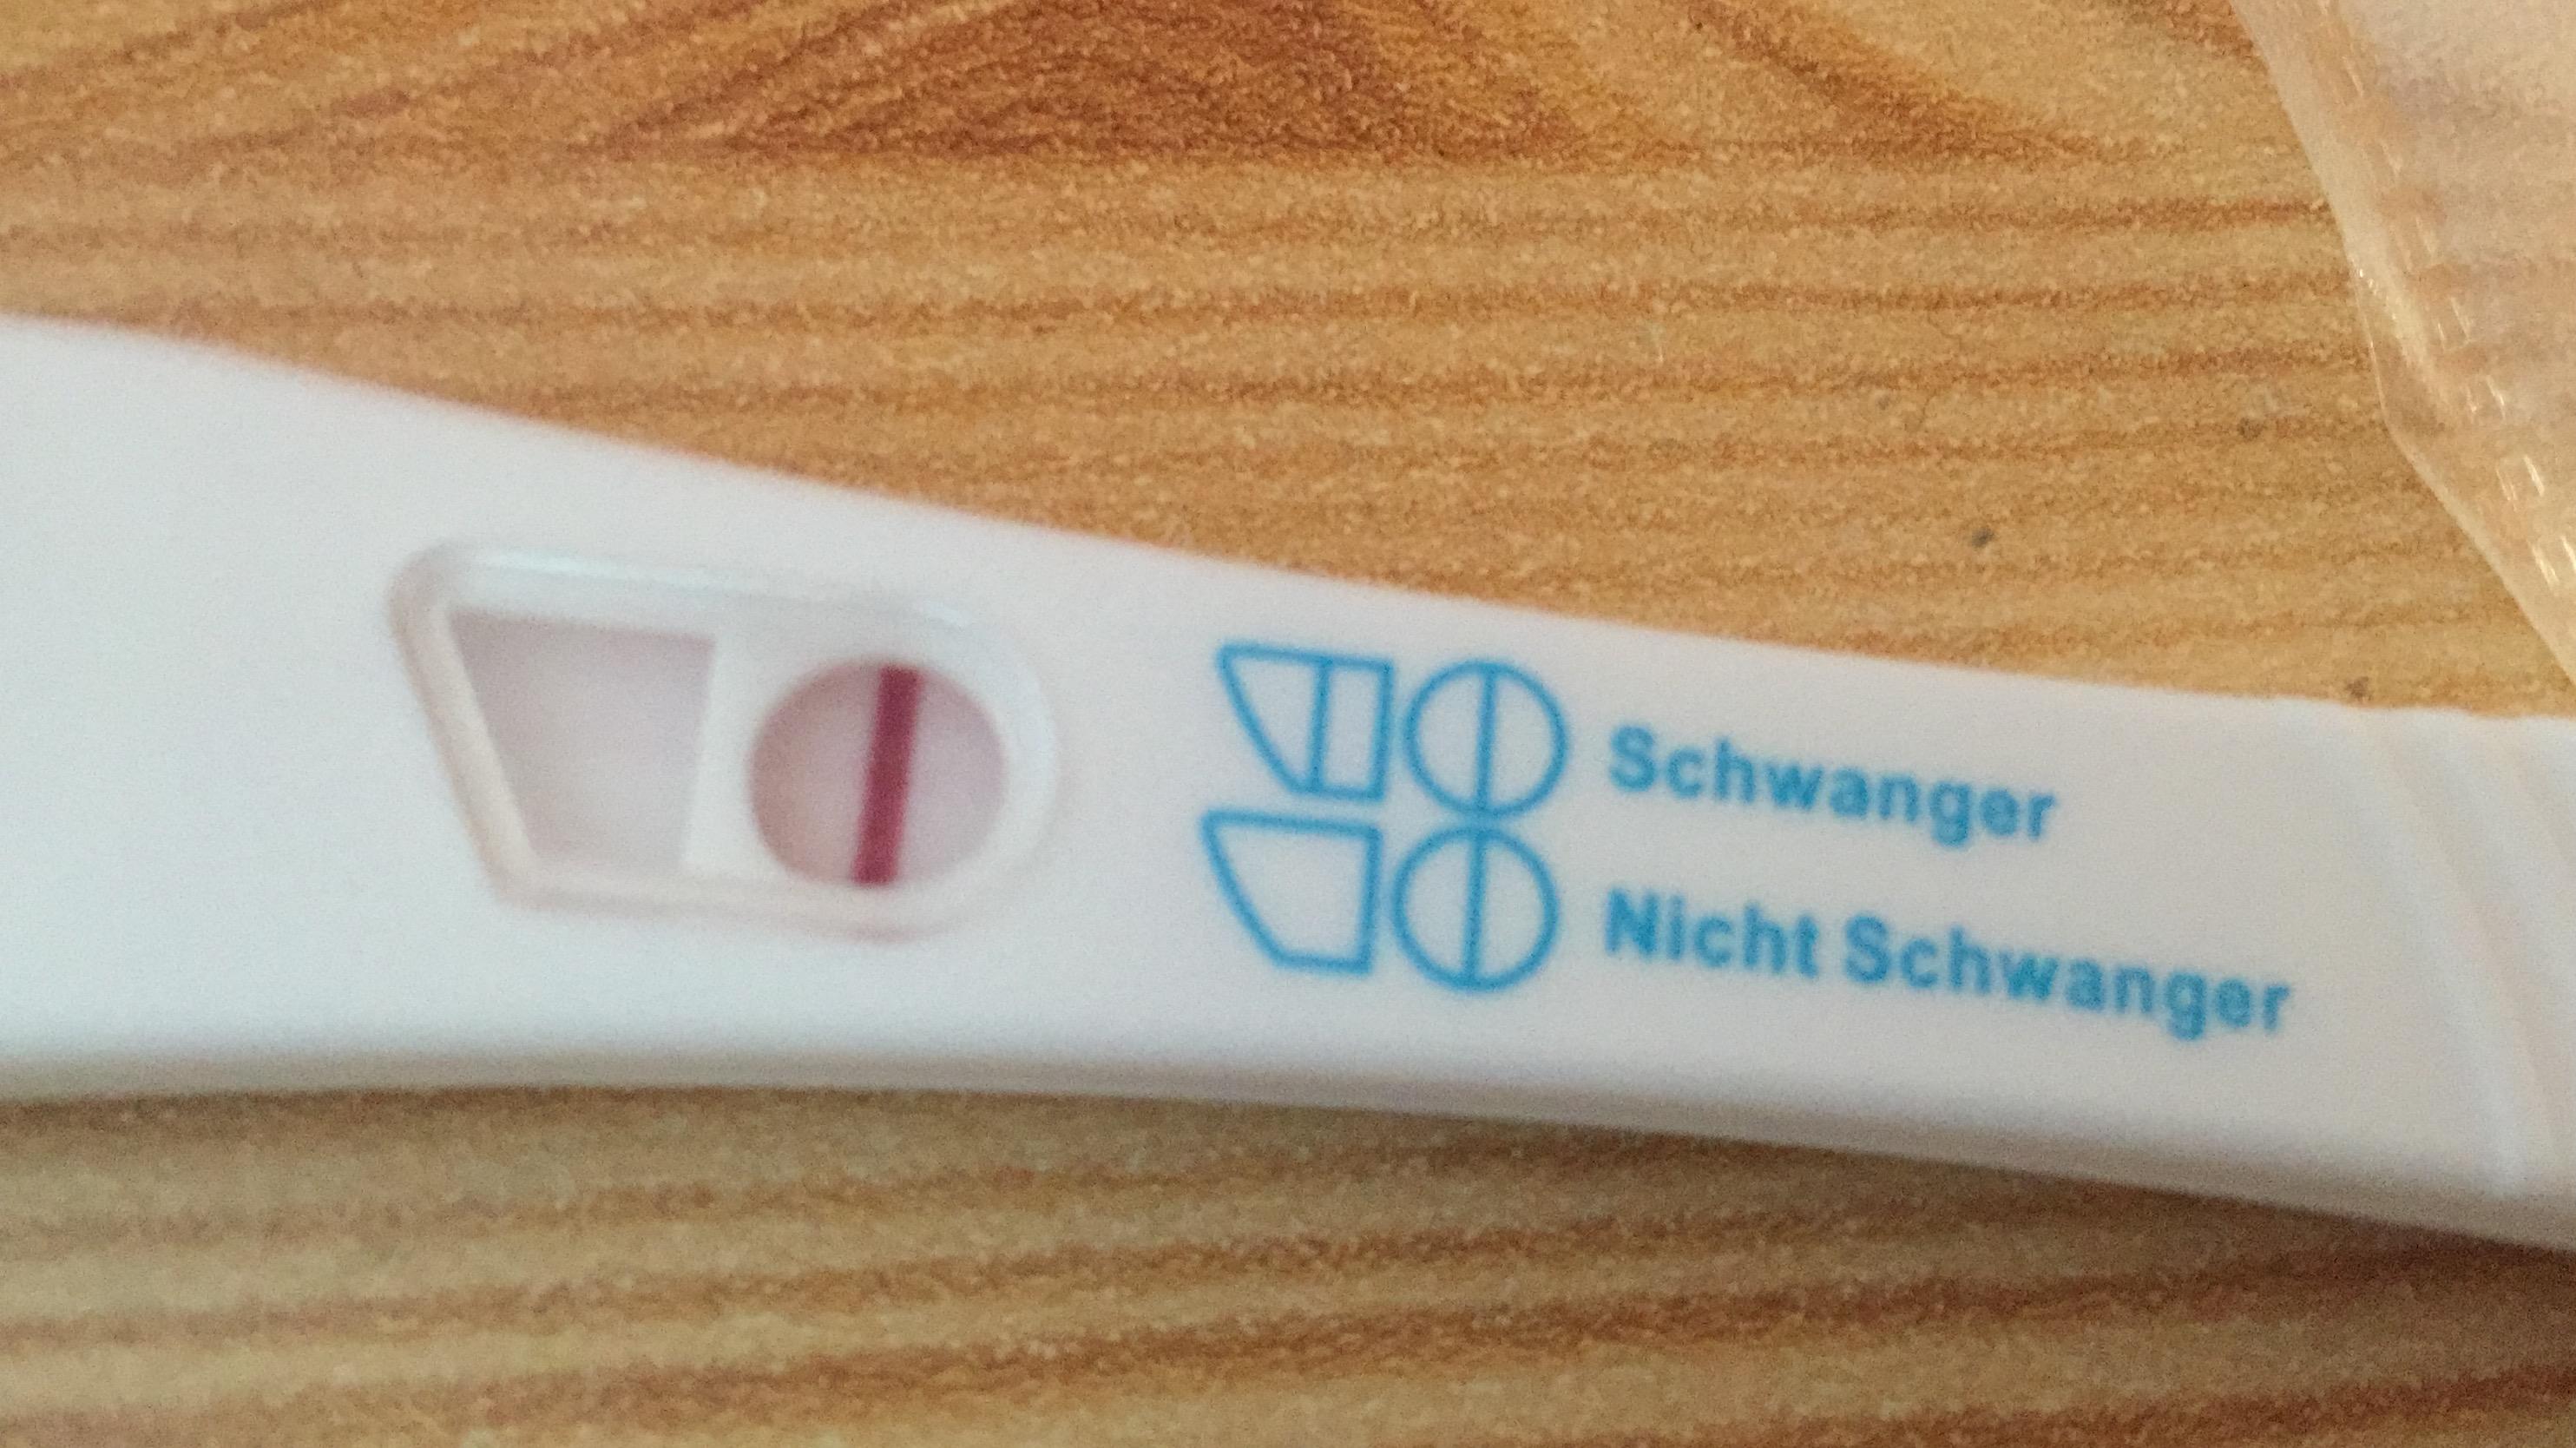 Testamed Sst negativ? (schwanger, Schwangerschaftstest